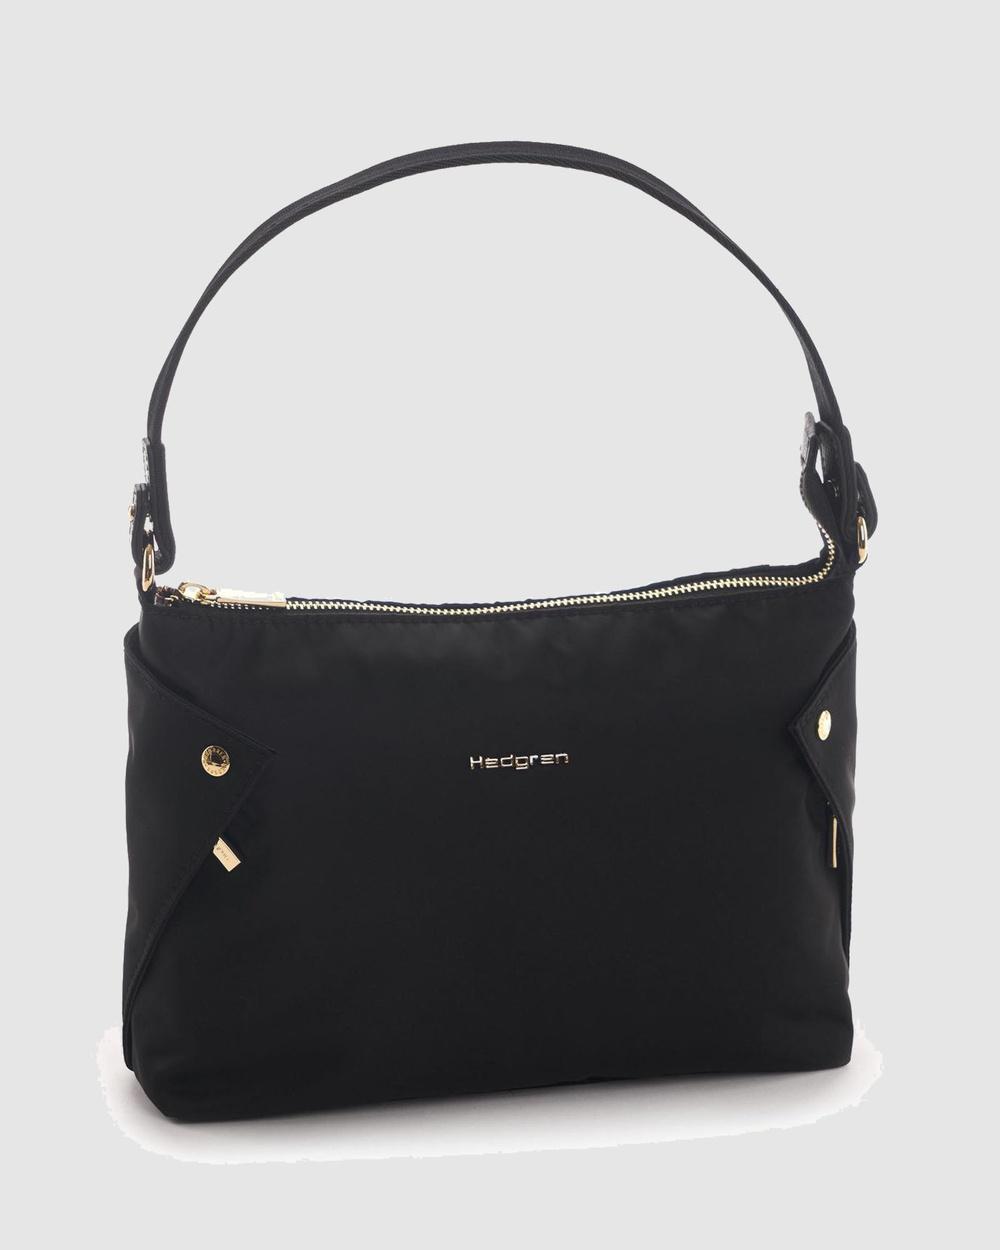 Hedgren Reflect Mini Hobo Handbags Black Australia